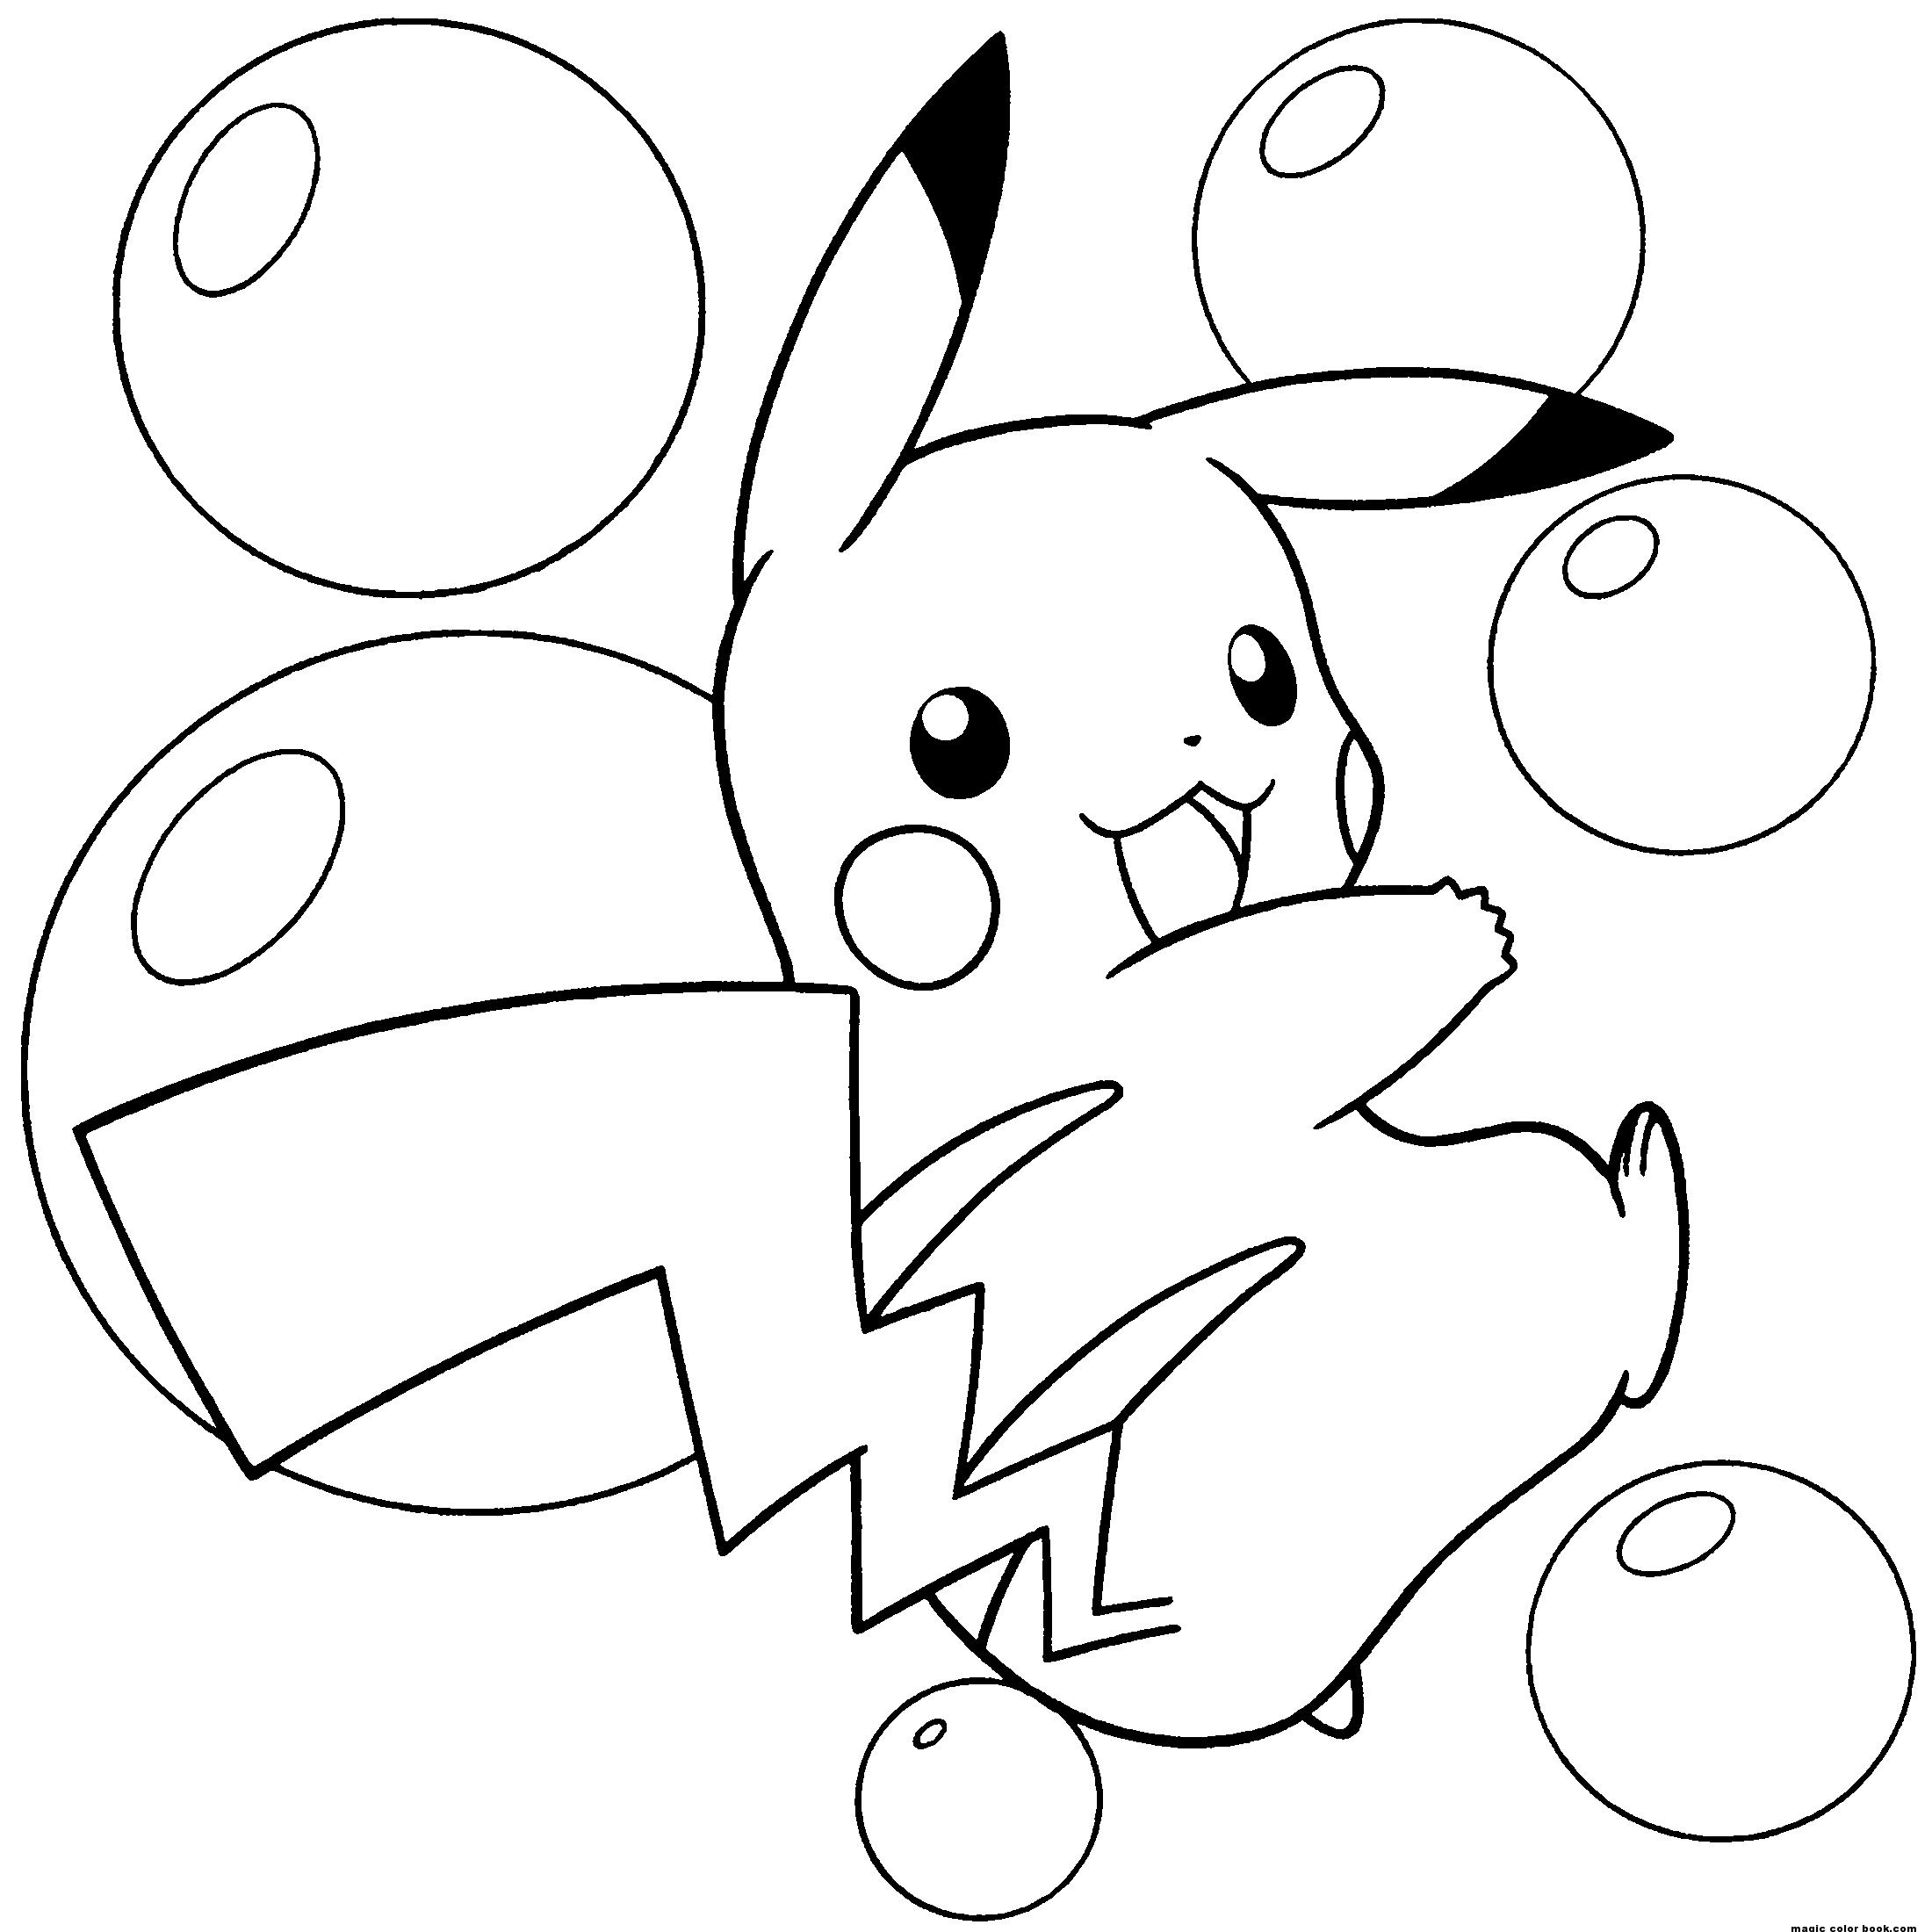 81 Dibujos De Pikachu Para Colorear Oh Kids Page 3